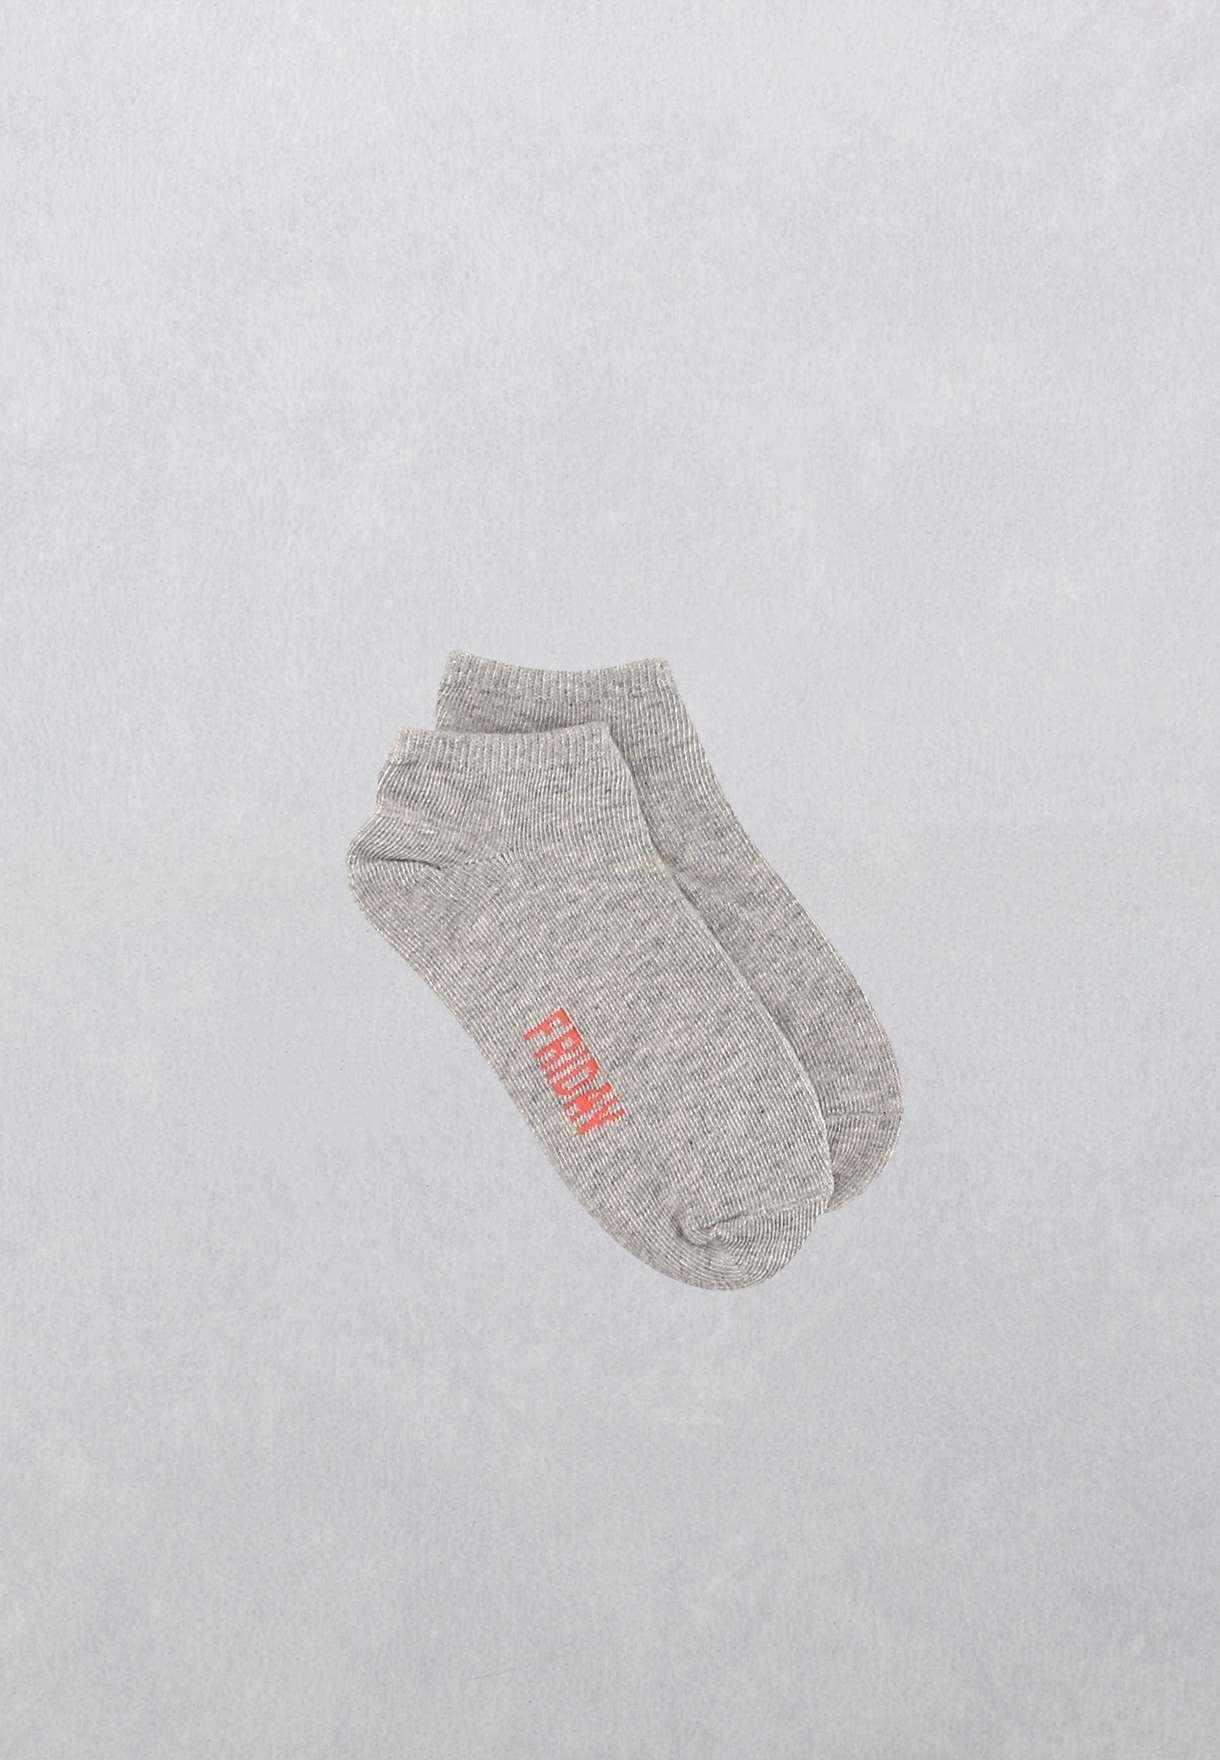 FreeDay Kids Socks